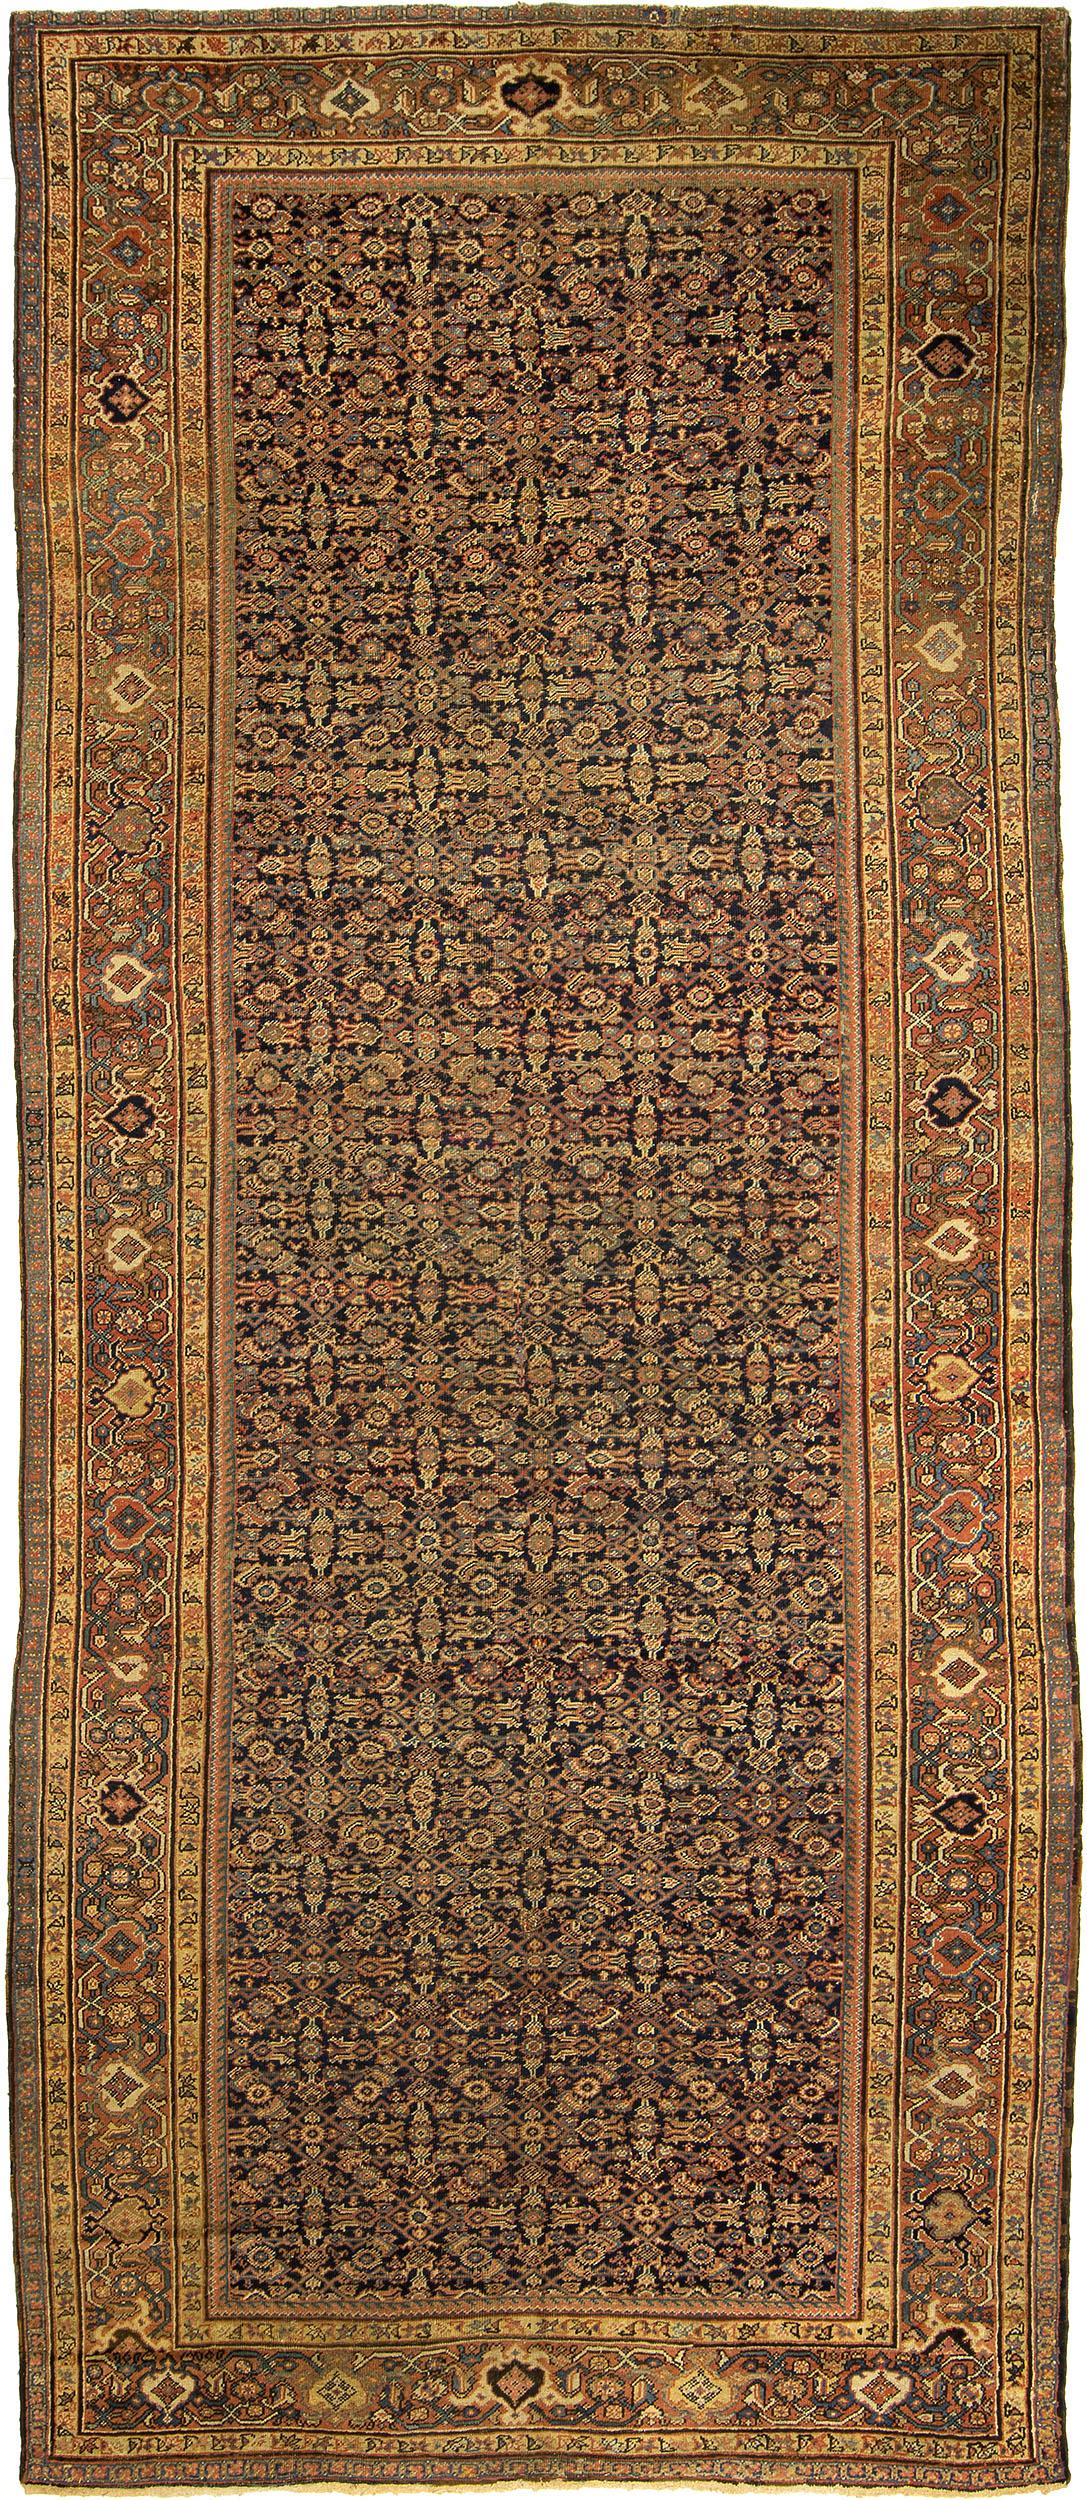 "Fereghan Gallery Carpet 17' 0"" x 7' 2"""